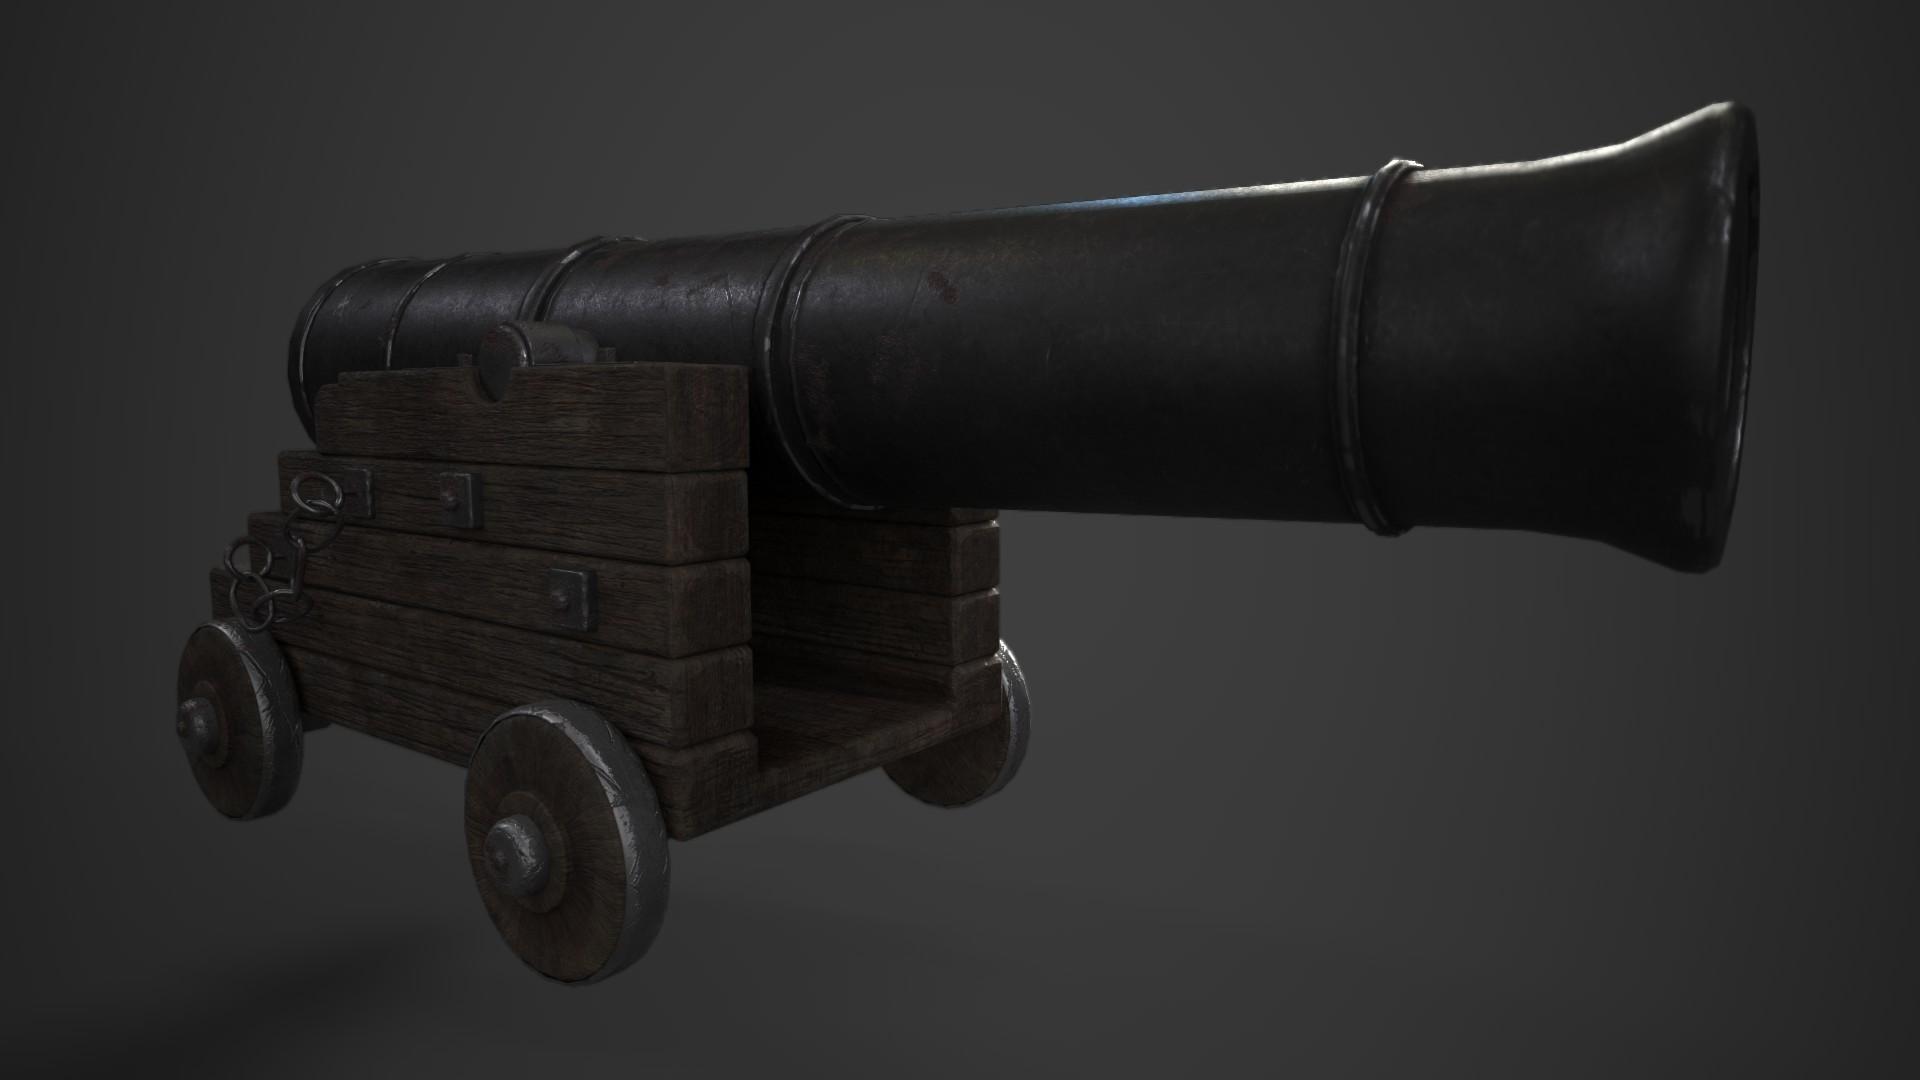 Philipp schmidt cannon 1